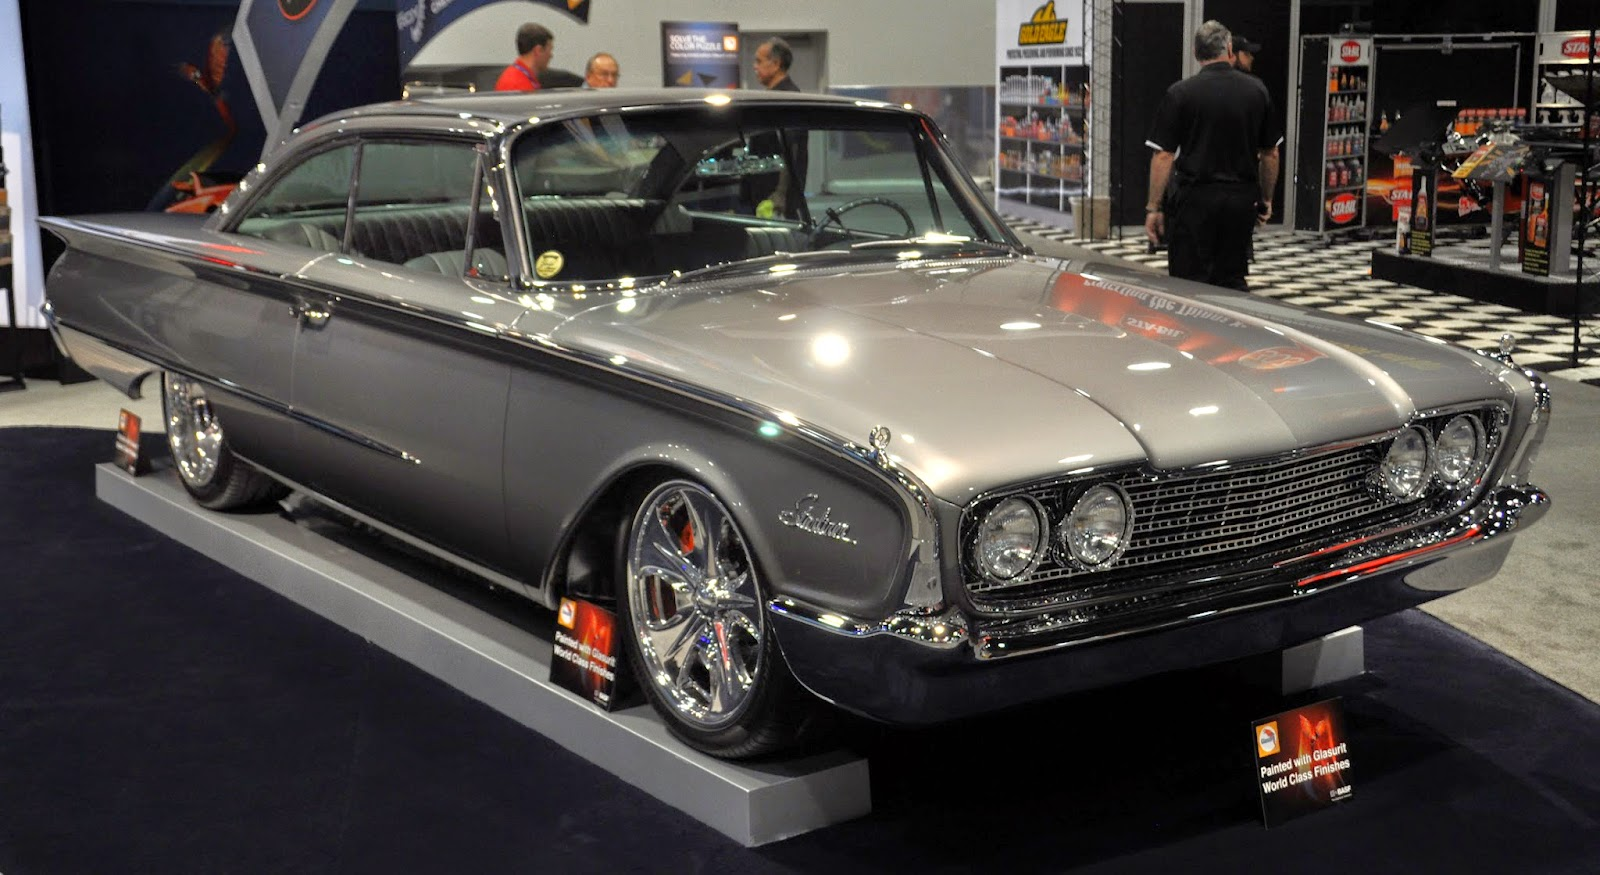 Chip Foose Personal Car Collection Just a \x3cb\x3ecar\x3c/b\x3e guy ...